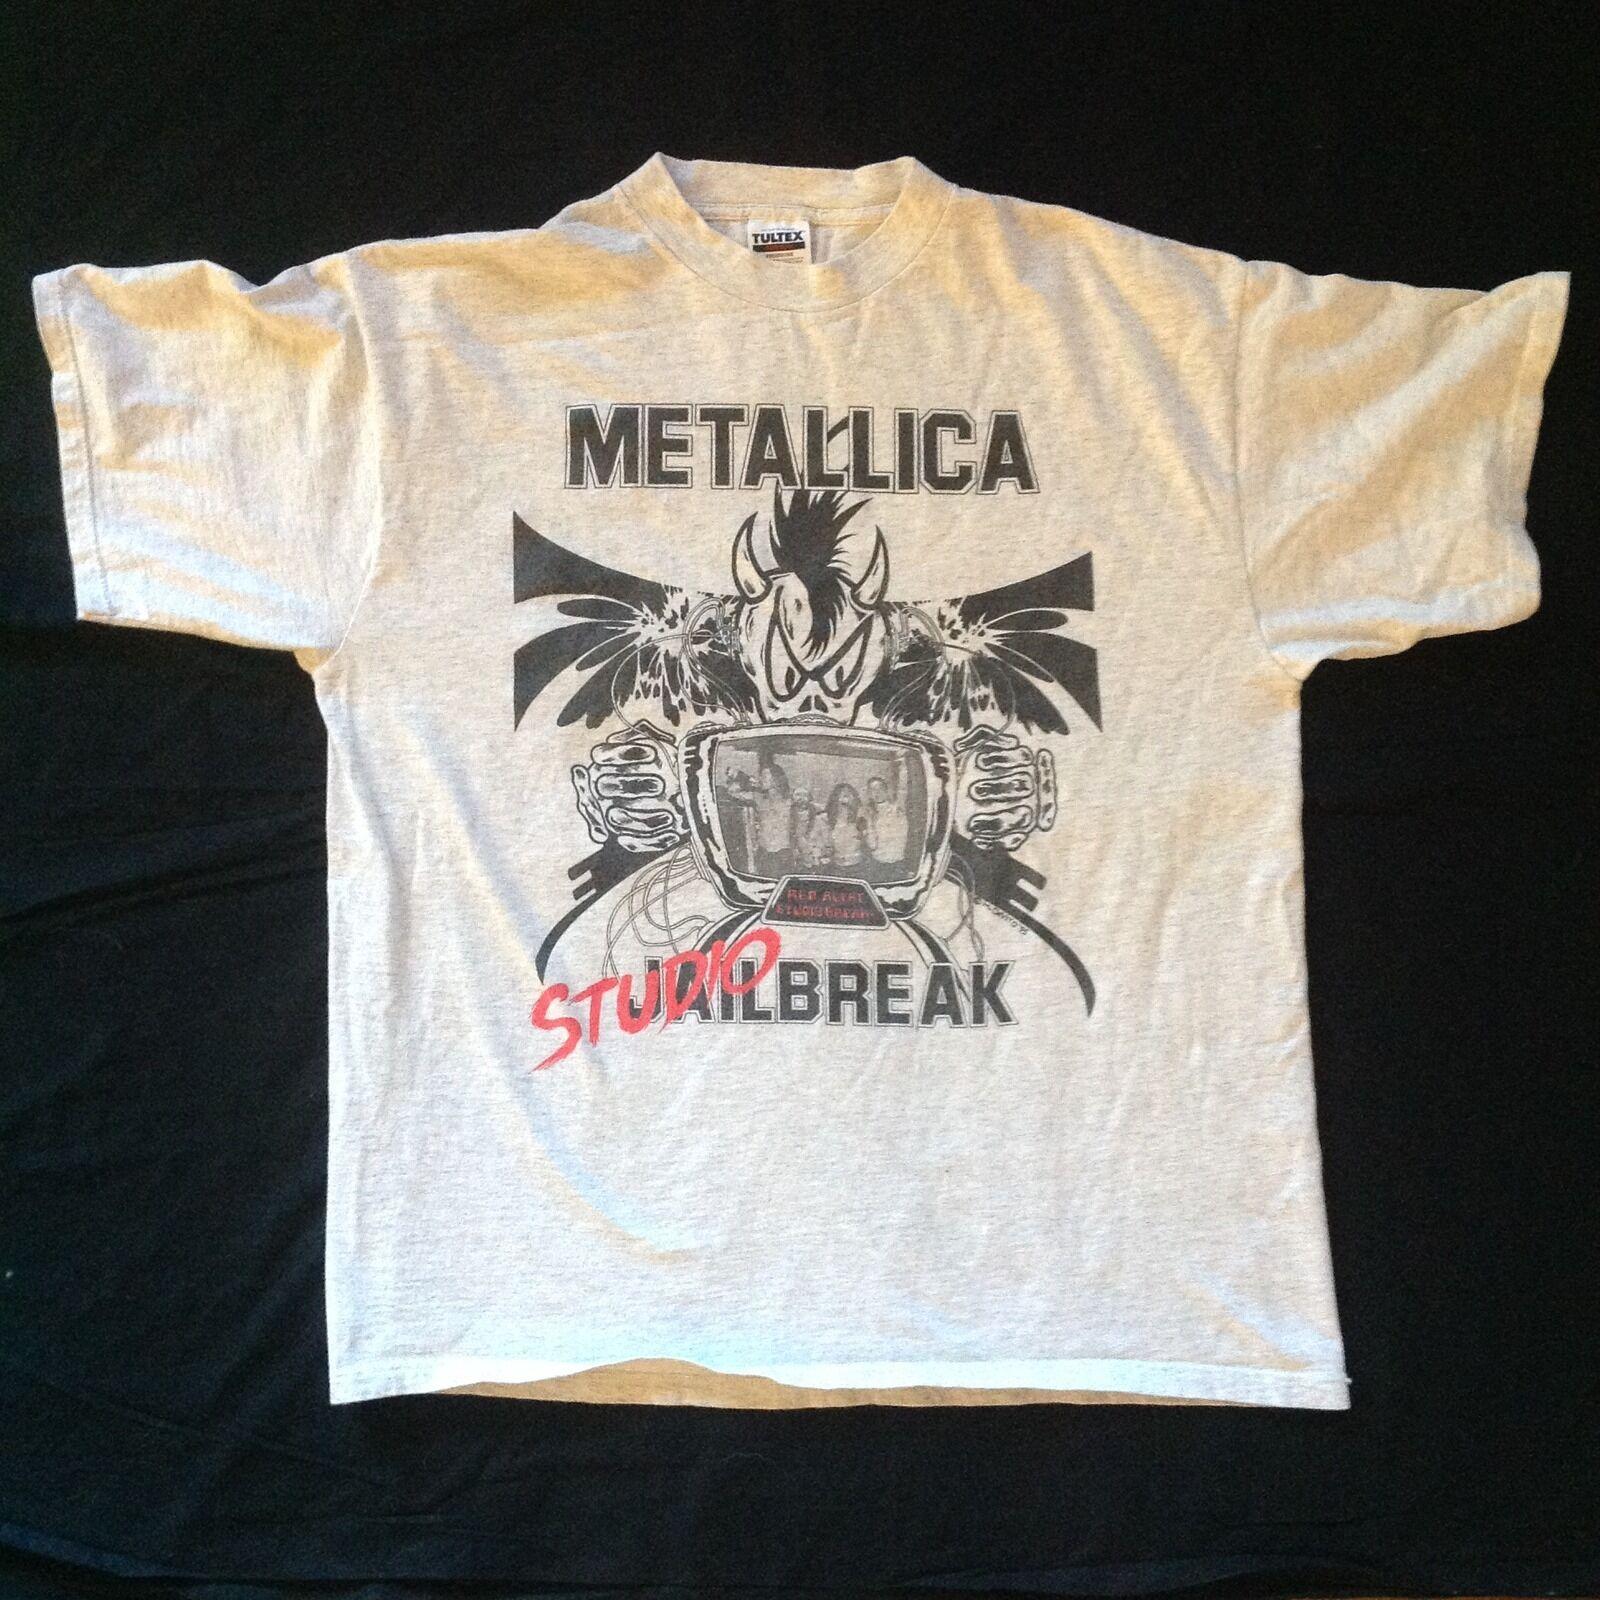 METALLICA shirt t vintage tshirt DONINGTON '95 studio break 90s 1995